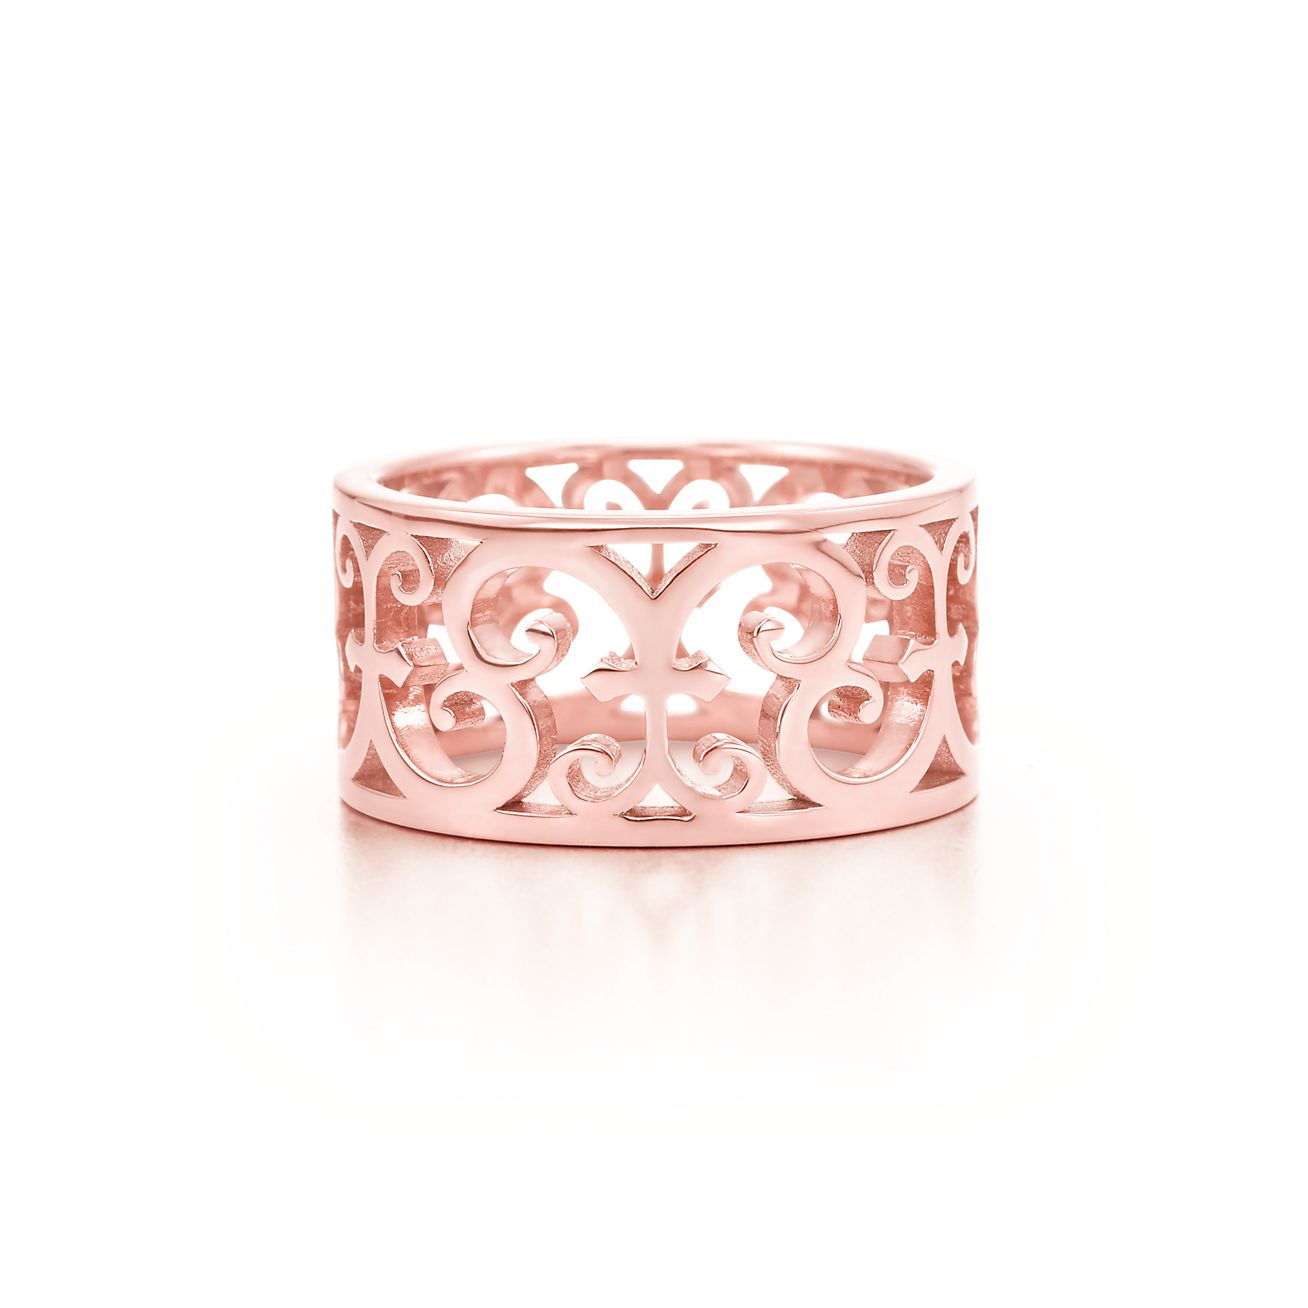 Tiffany Enchant wide ring in Rubedo metal - Size 4 1/2 Tiffany & Co.